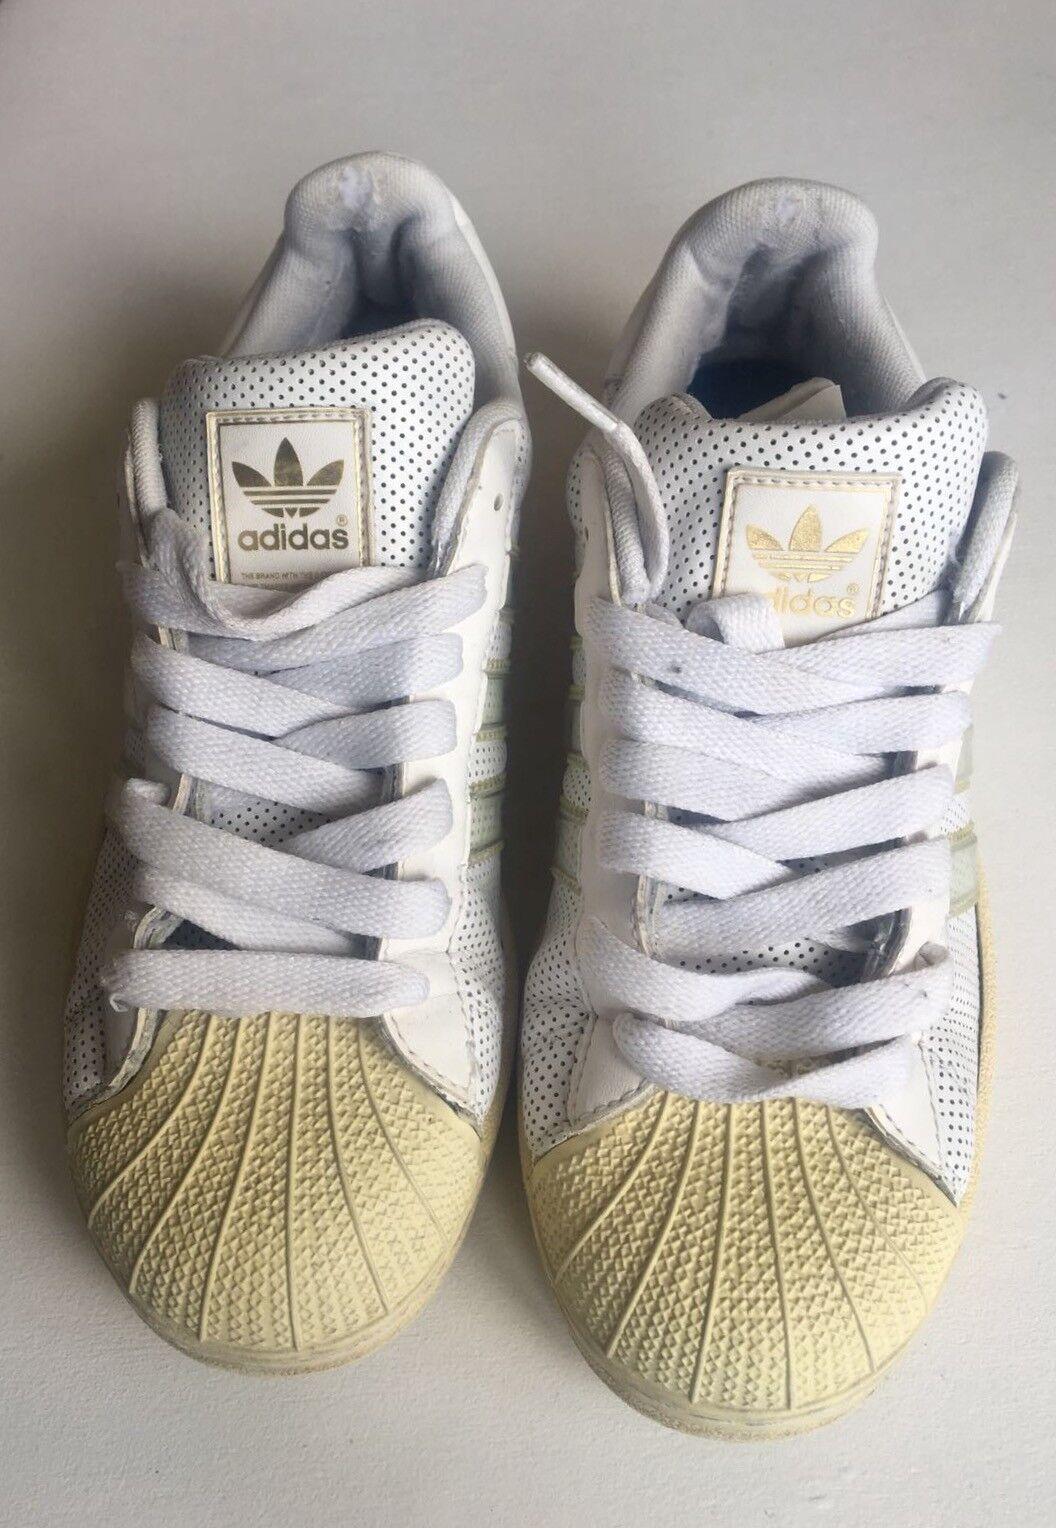 53d2bf63b Adidas Superstar Unisex Men s   Women s White Yellow